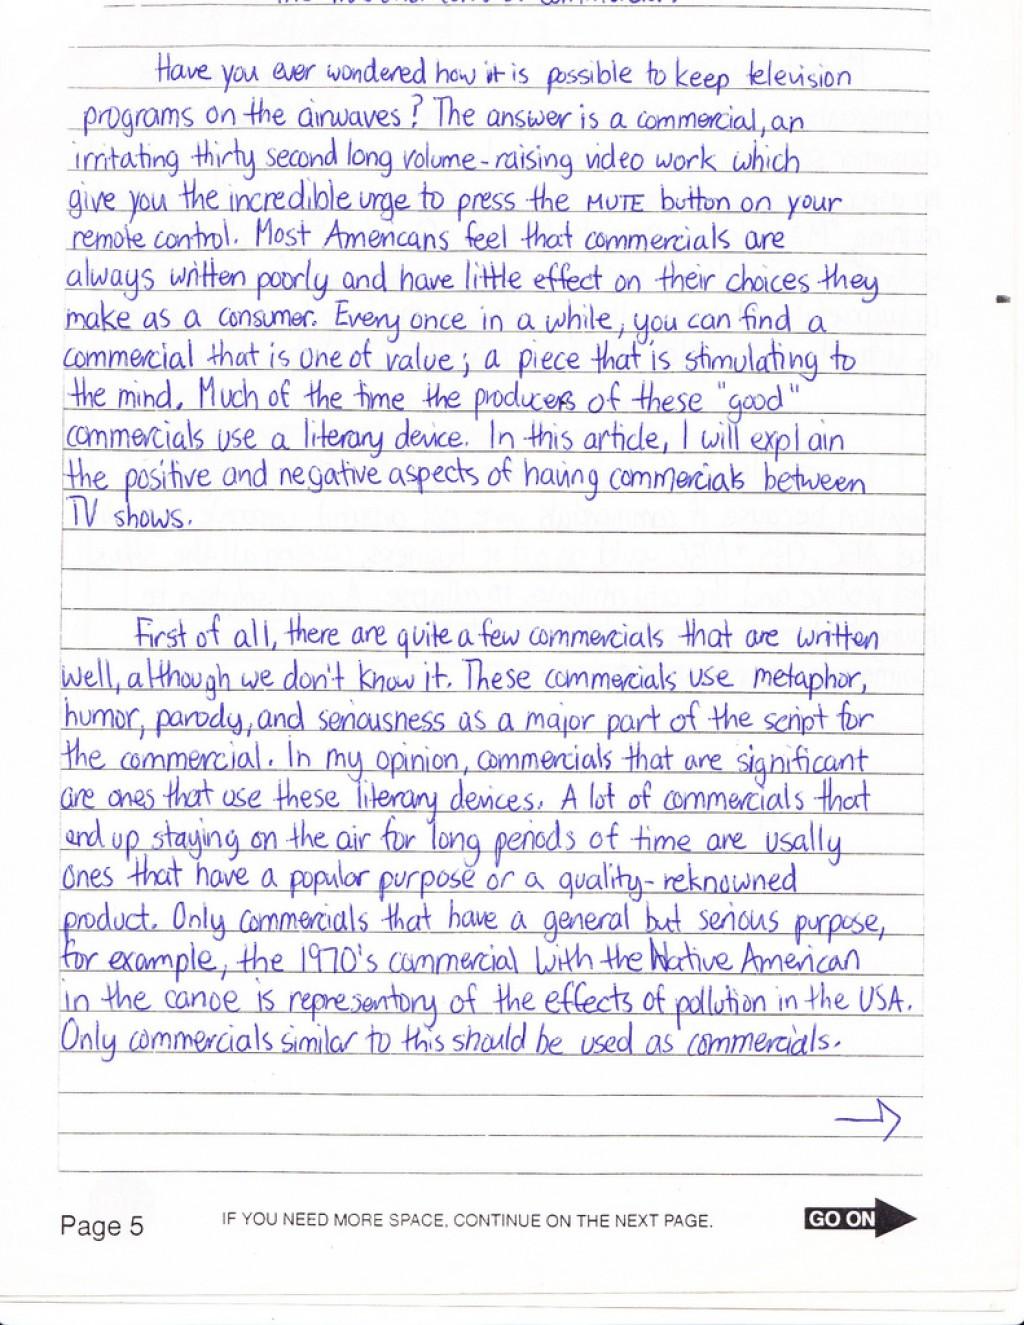 003 Sat Essay Average Score Tips Singular Pdf Writing Prepscholar Large